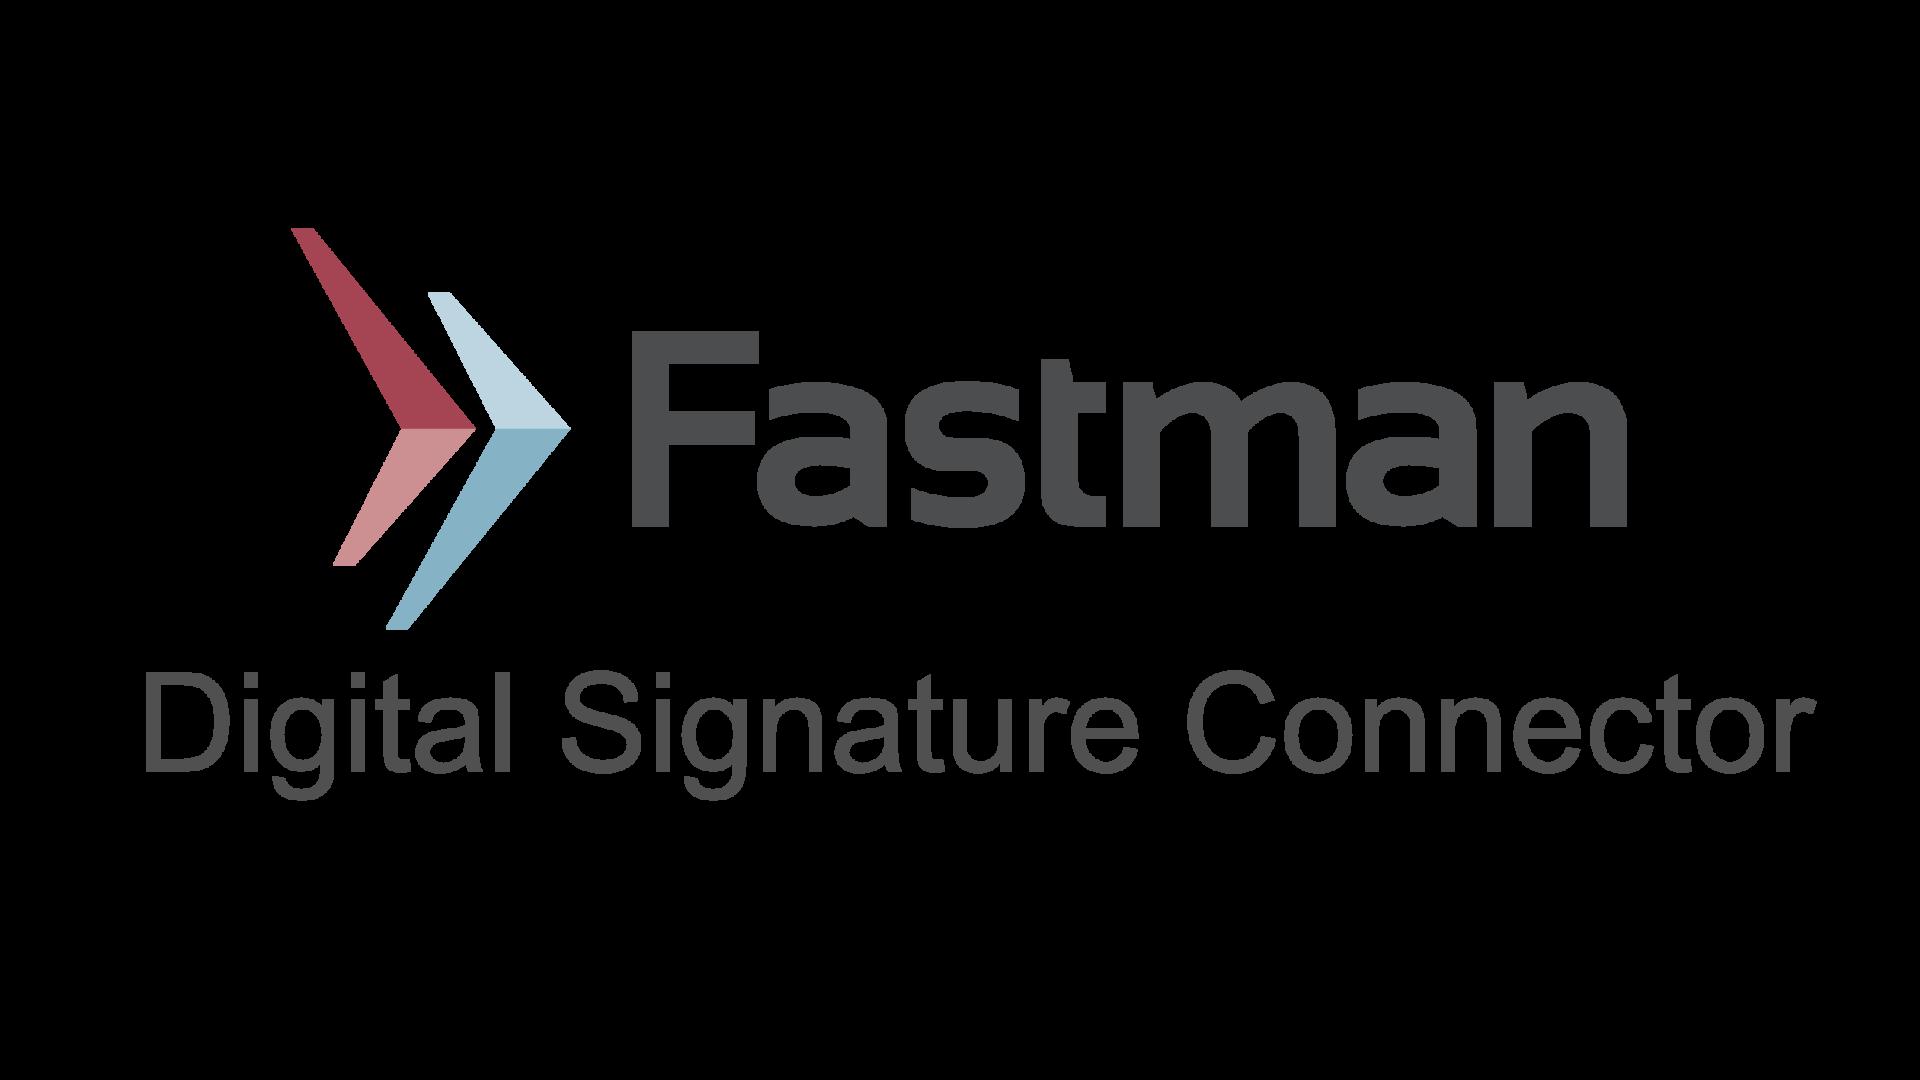 Fastman Digital Signature Connector